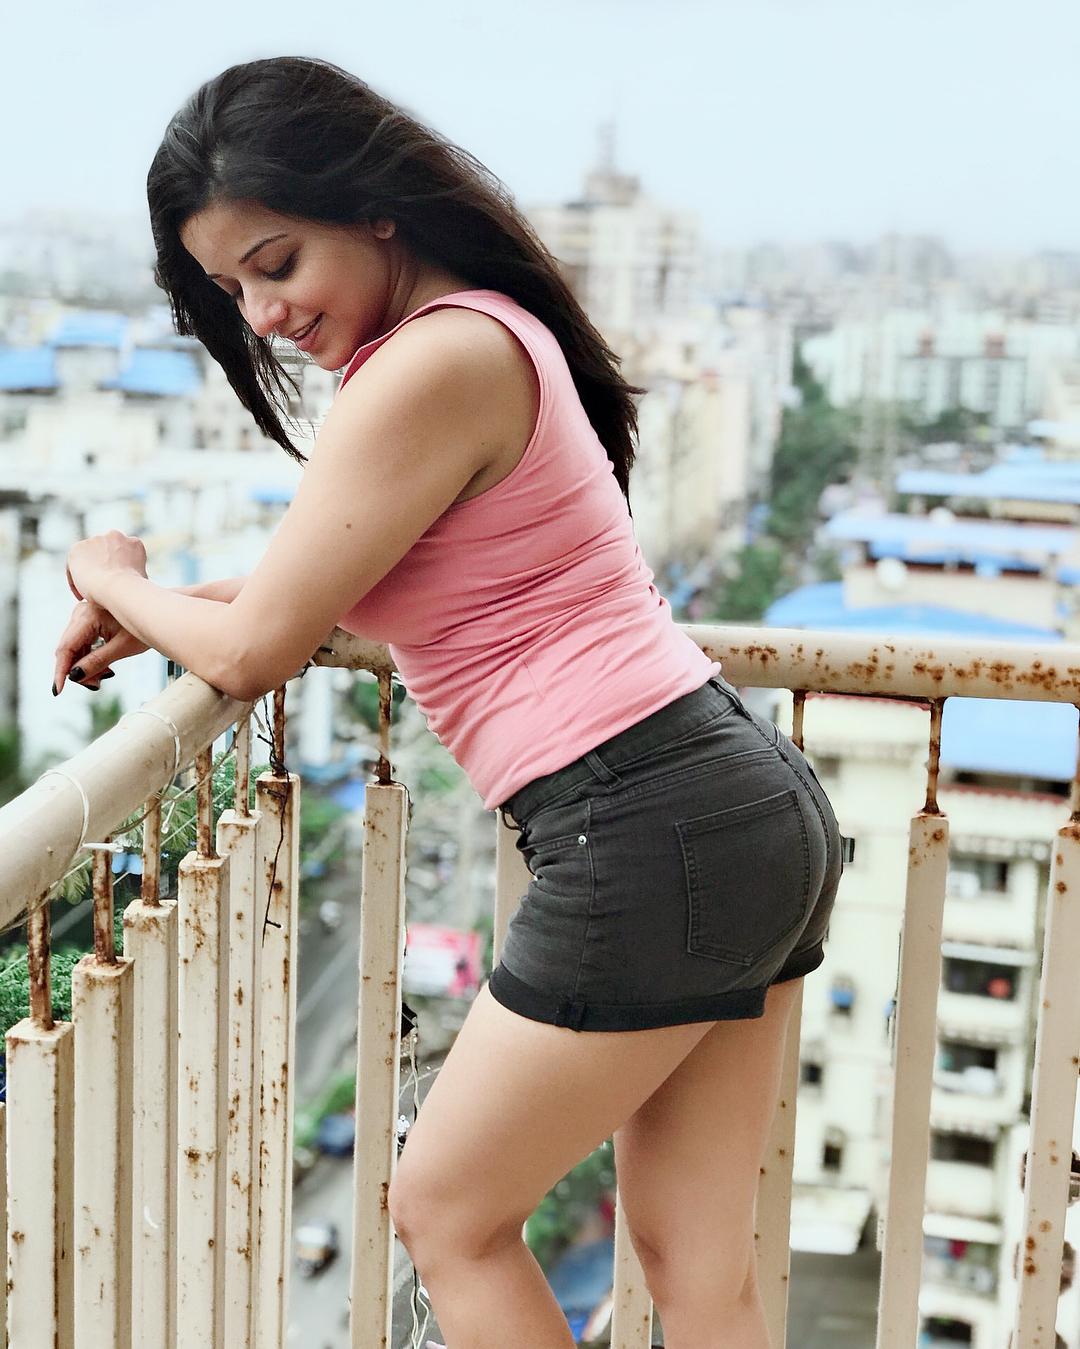 Monalisa Very Hot Photos - HD Actress Photo